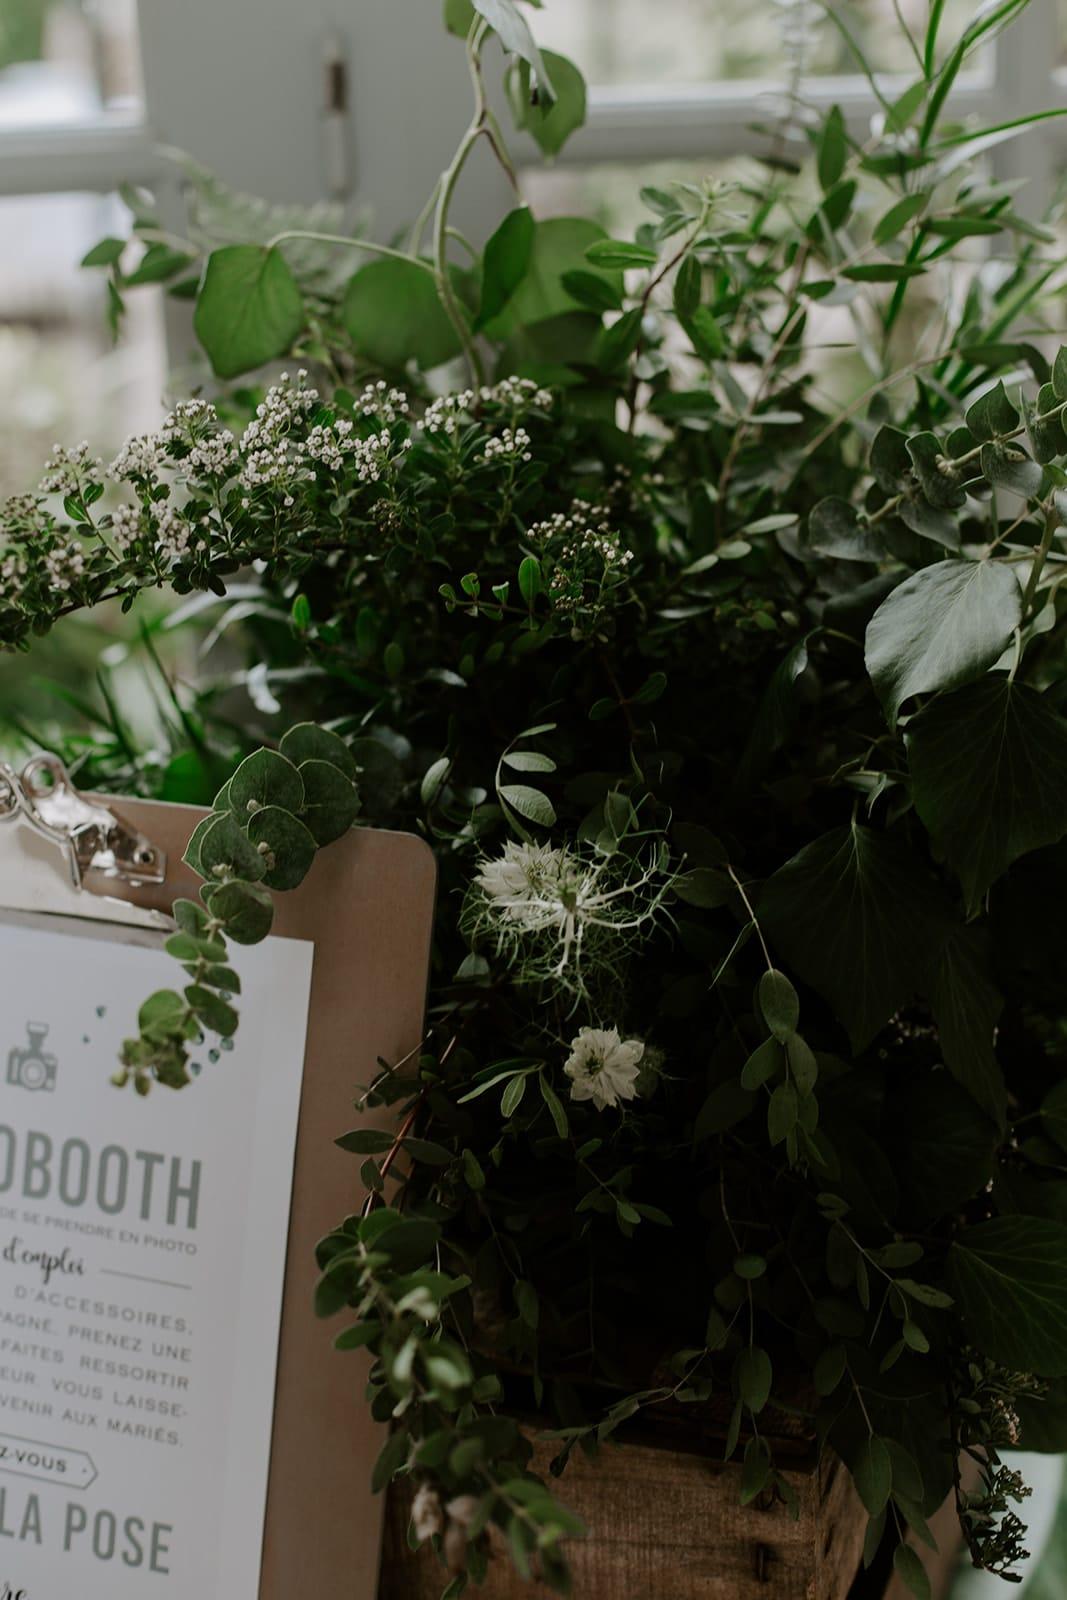 mariage_chateau_la_flocelliere_vendee_flavie_nelly_photographe-139-obonheurdesdames-decoration-mariage-location-vegetal